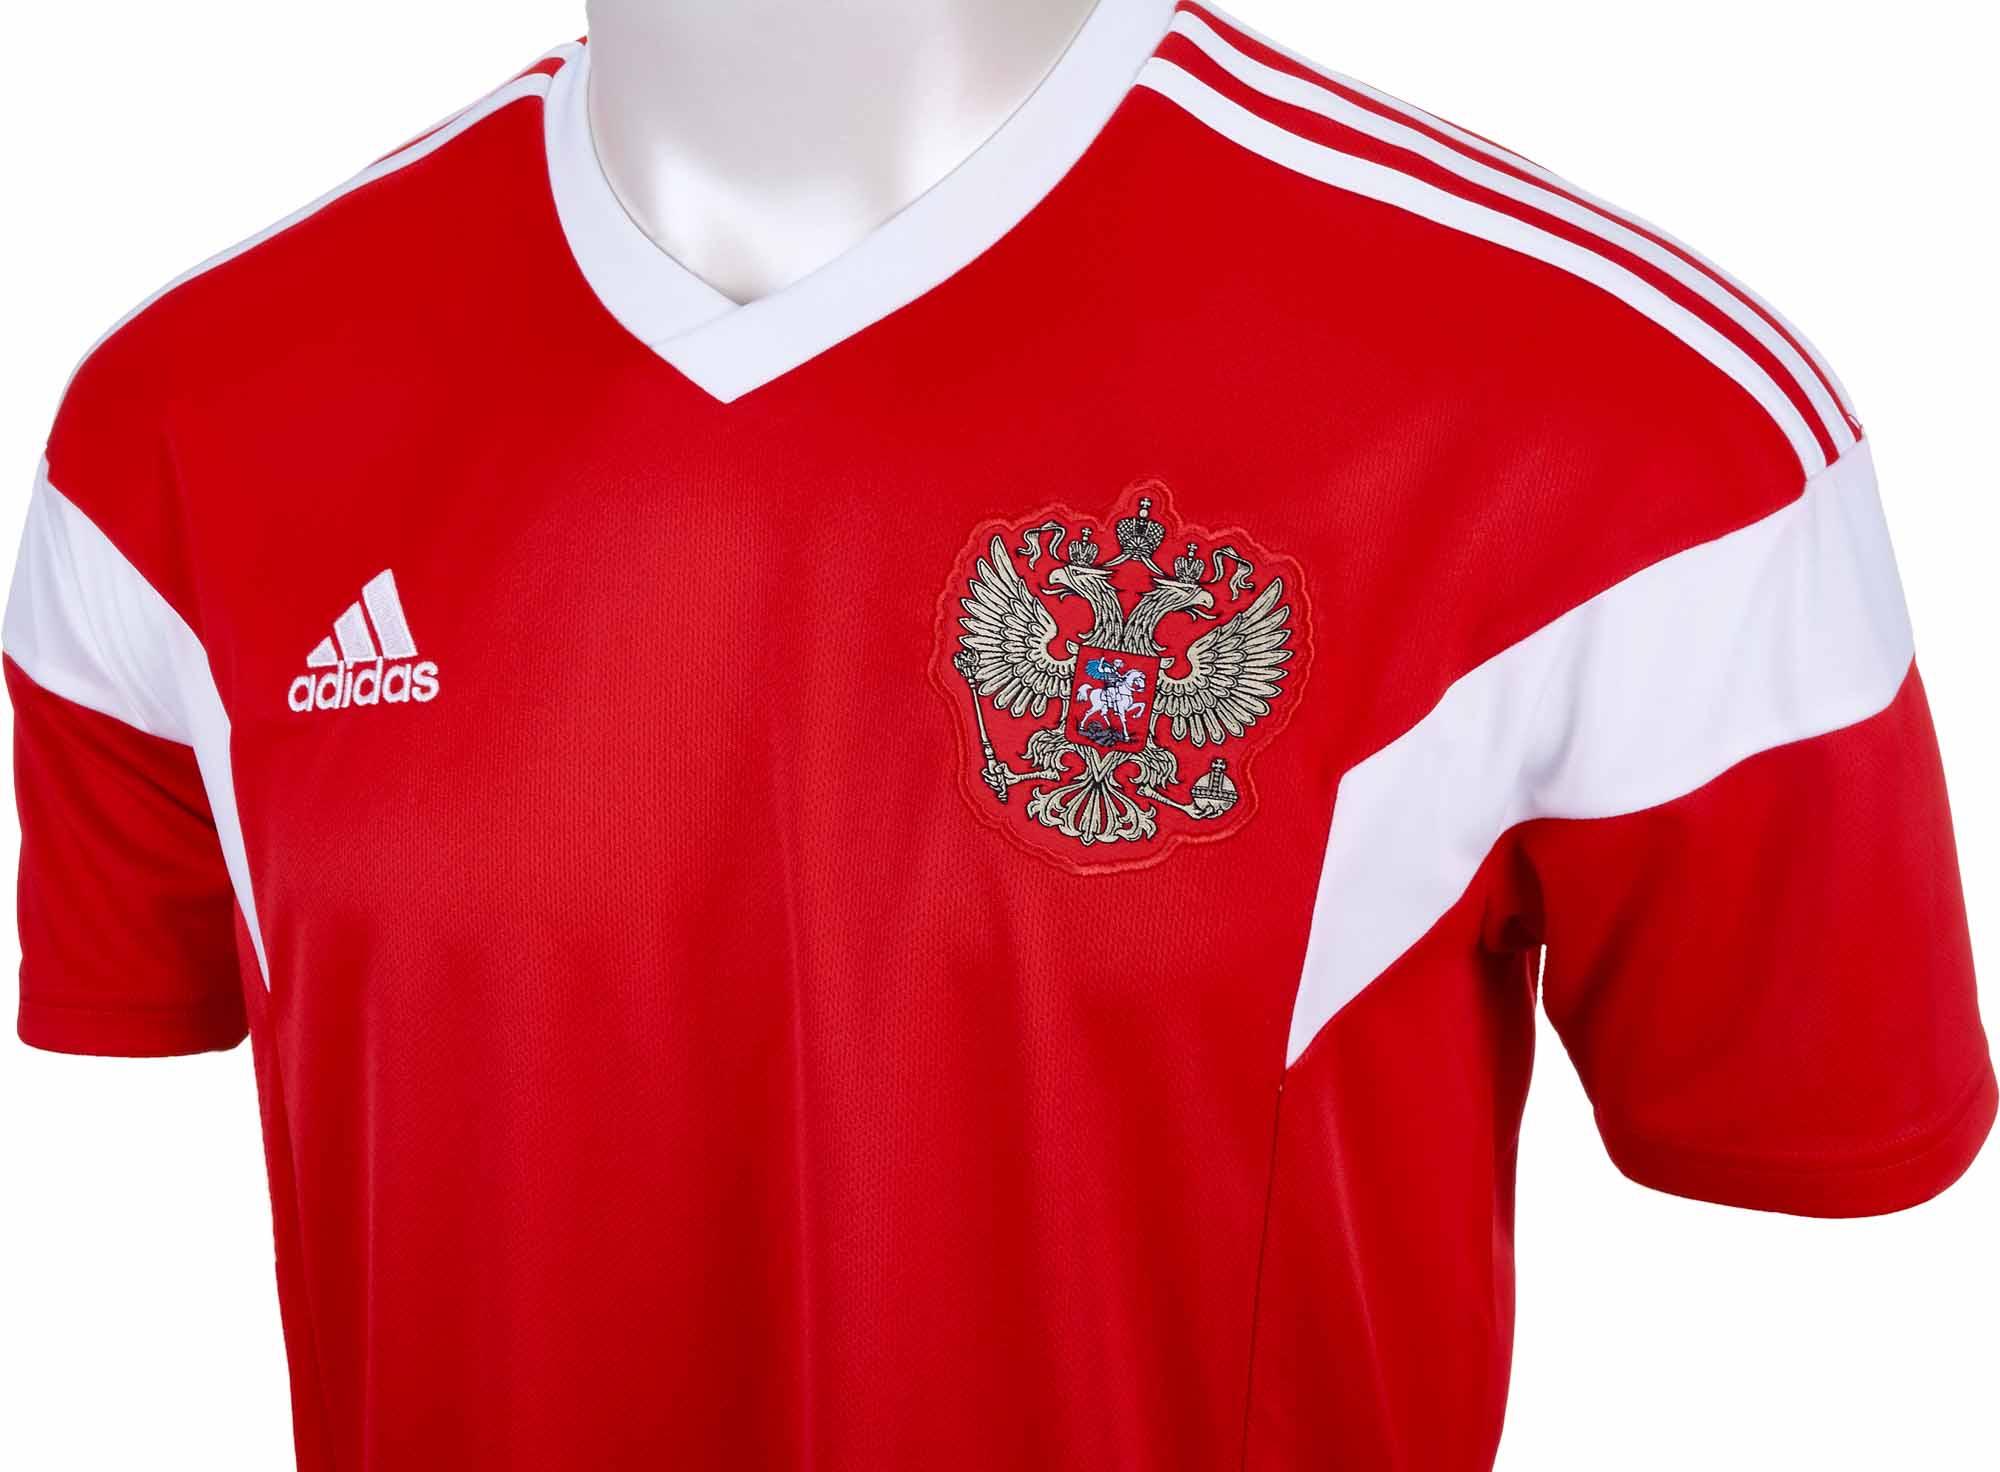 adidas Russia Home Jersey 2018-19 - SoccerPro.com